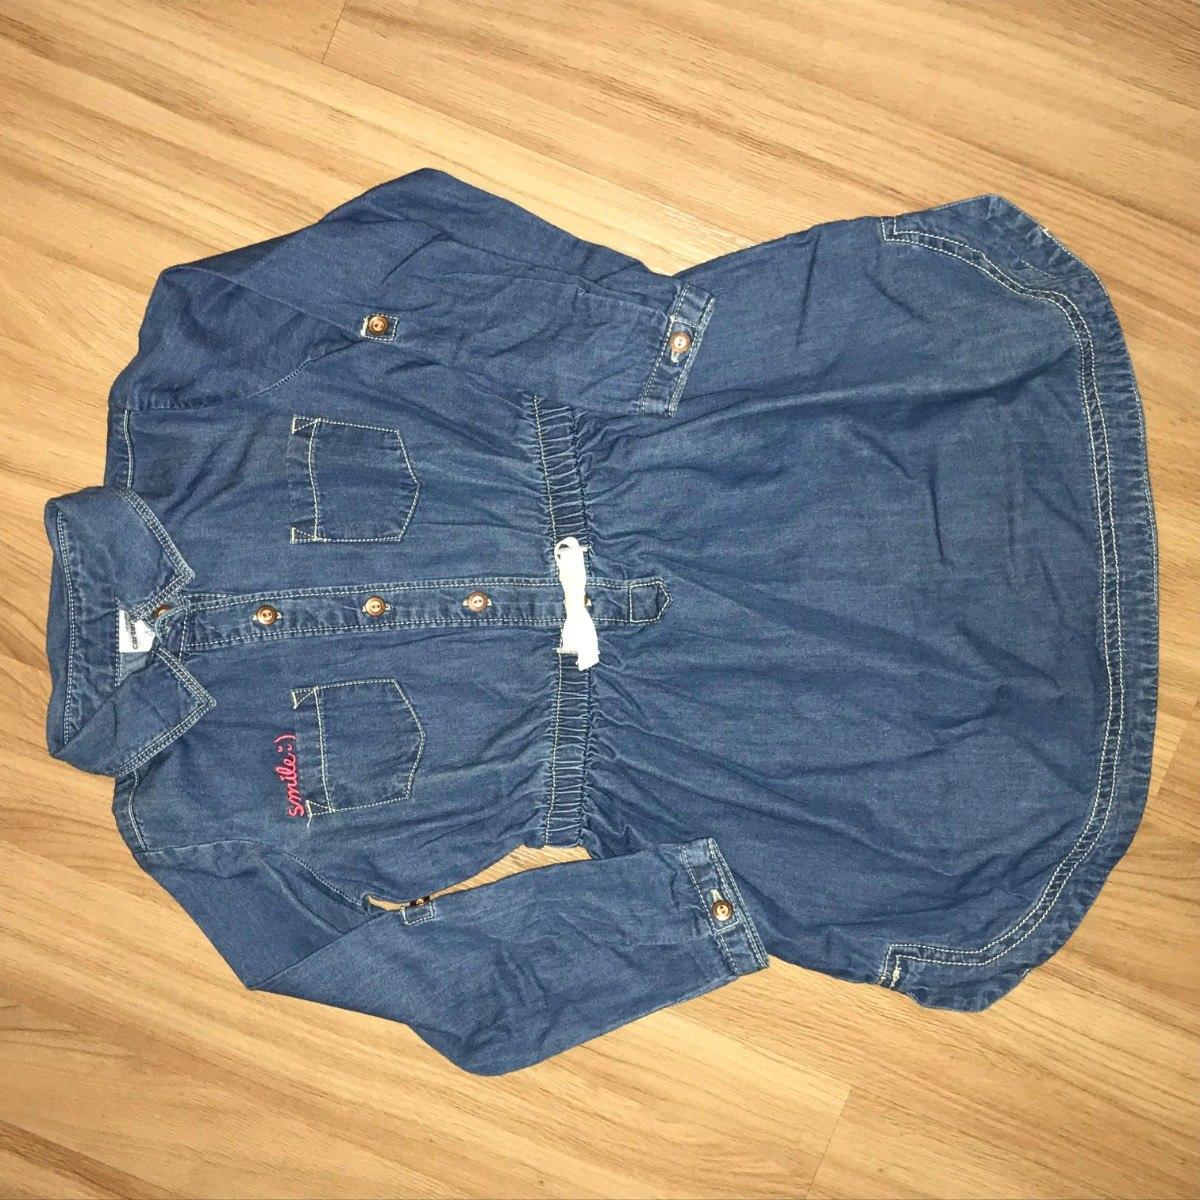 864c90d90cec62 Vestido Jeans Da Carters, Roupa Infantil Menina 4 Anos, Novo